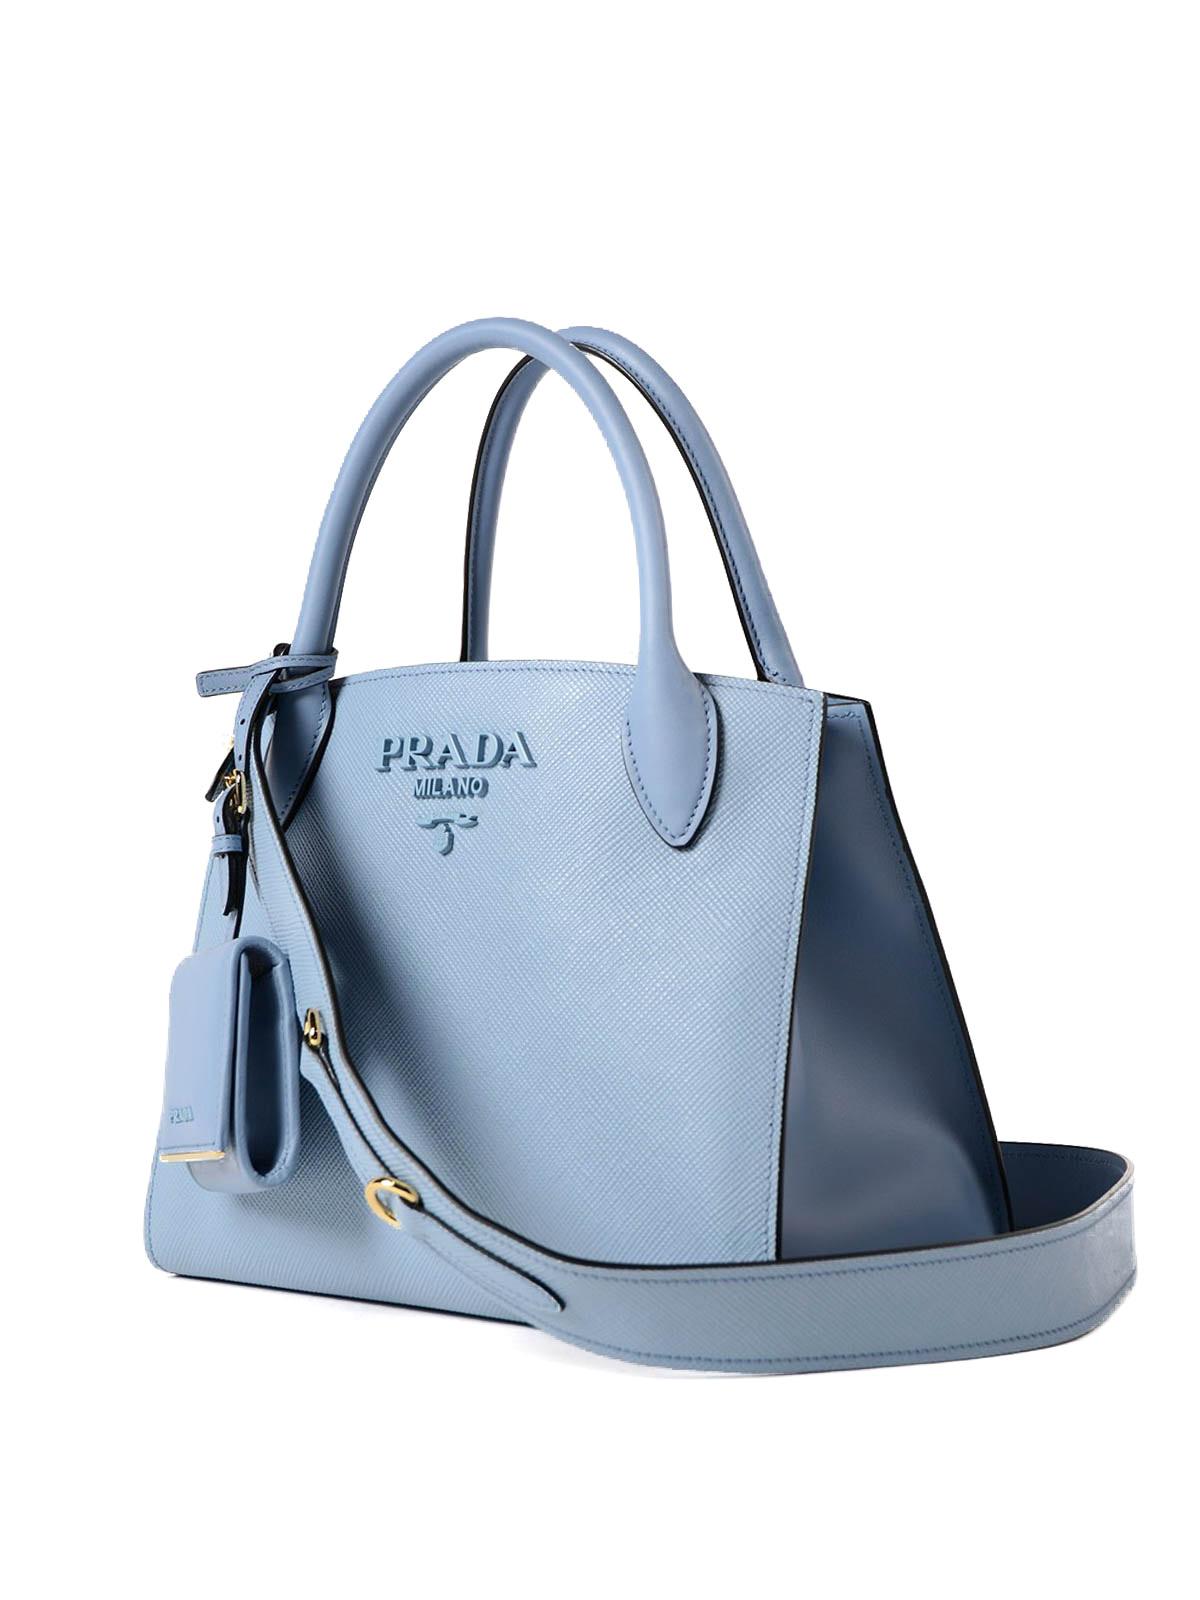 24f9bdfdce9f Prada Monochrome Saffiano Leather Bag | Stanford Center for ...